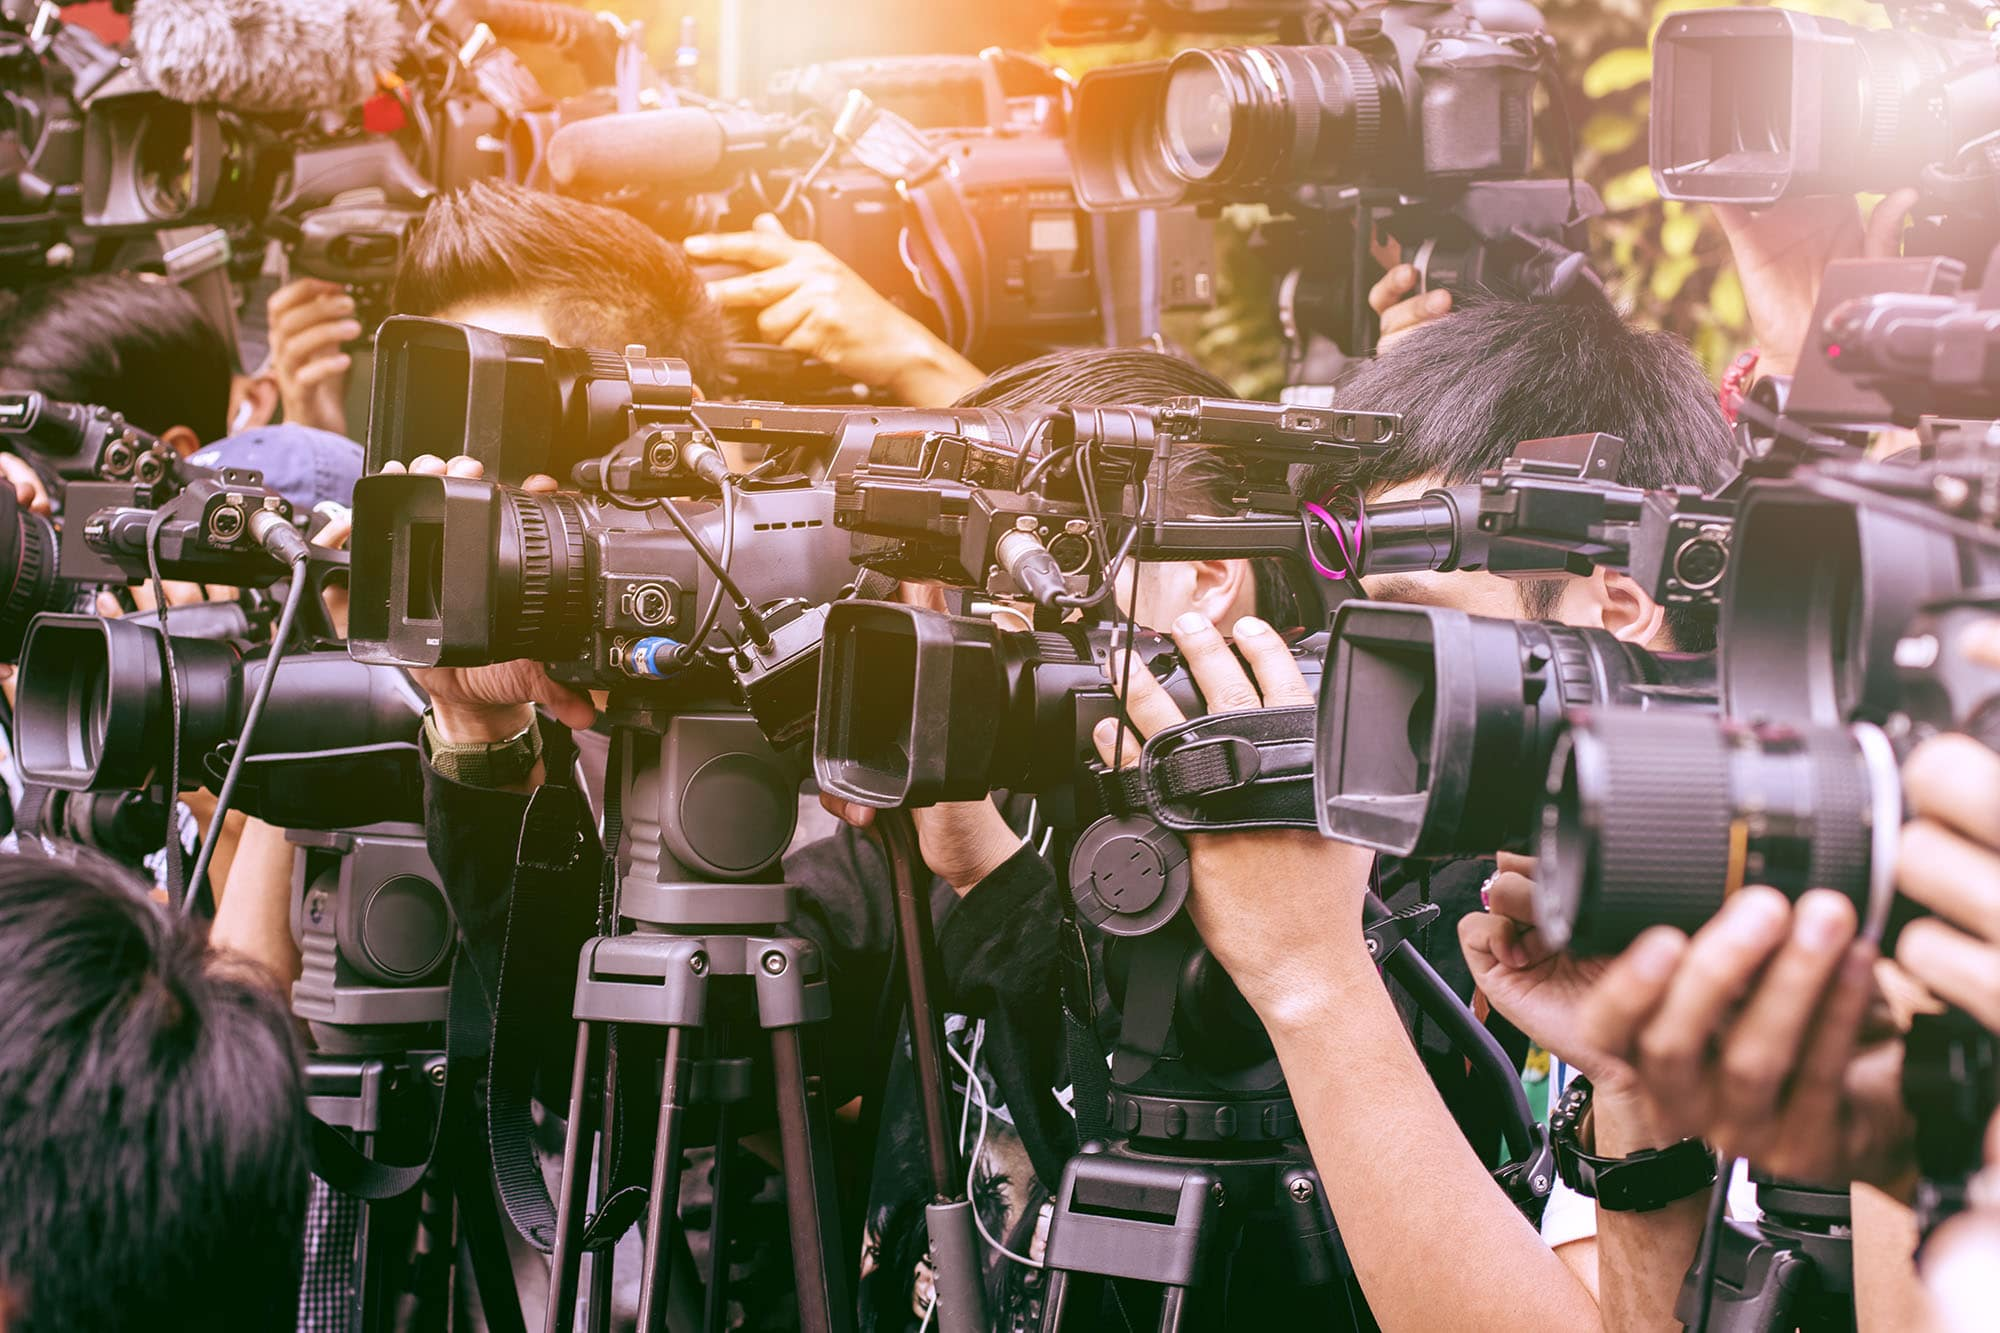 Het PESO-model: earned media in de spotlights